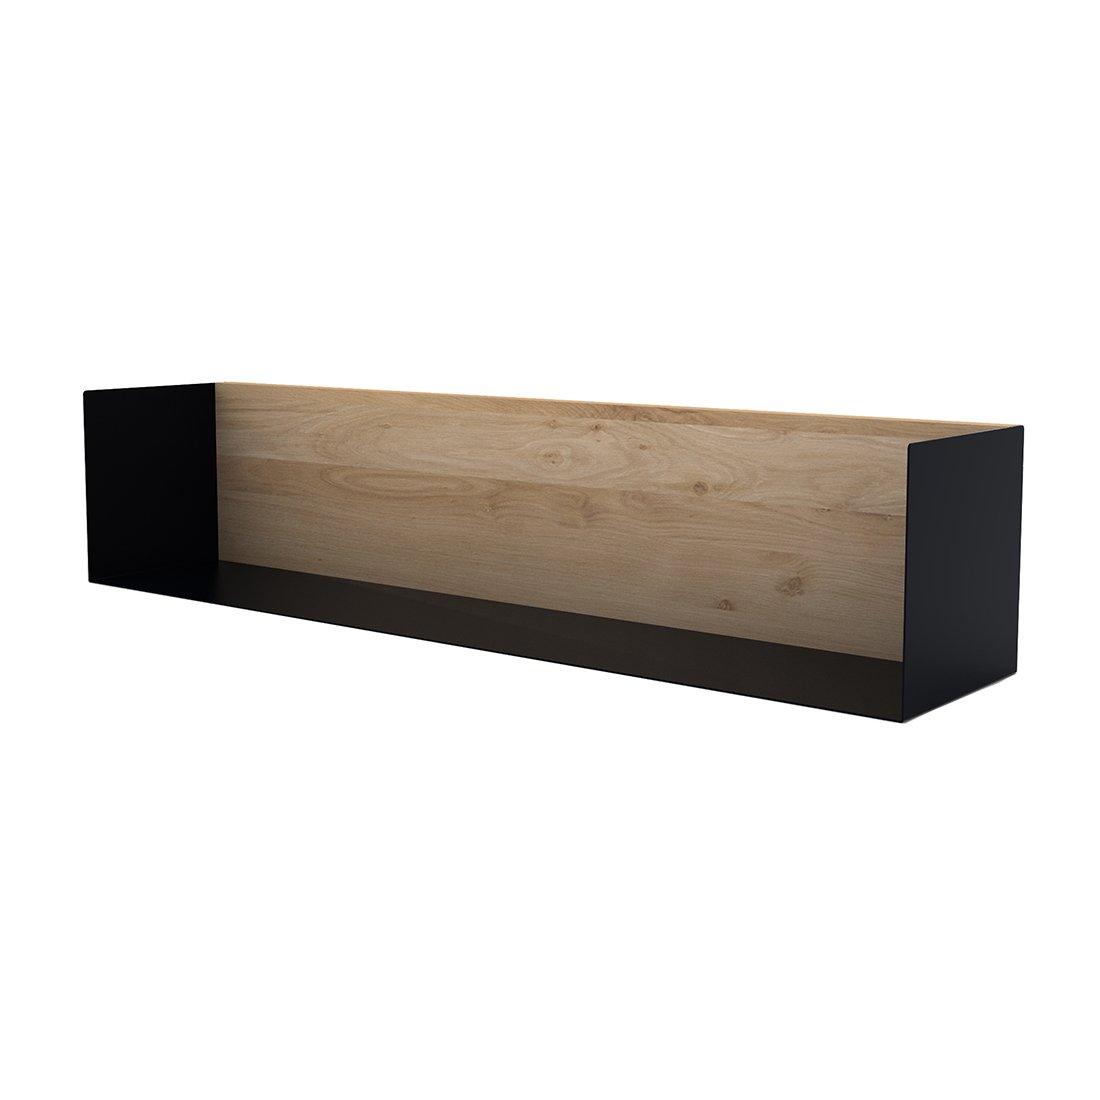 Ethnicraft U-Shelf Wandplank Zwart Large